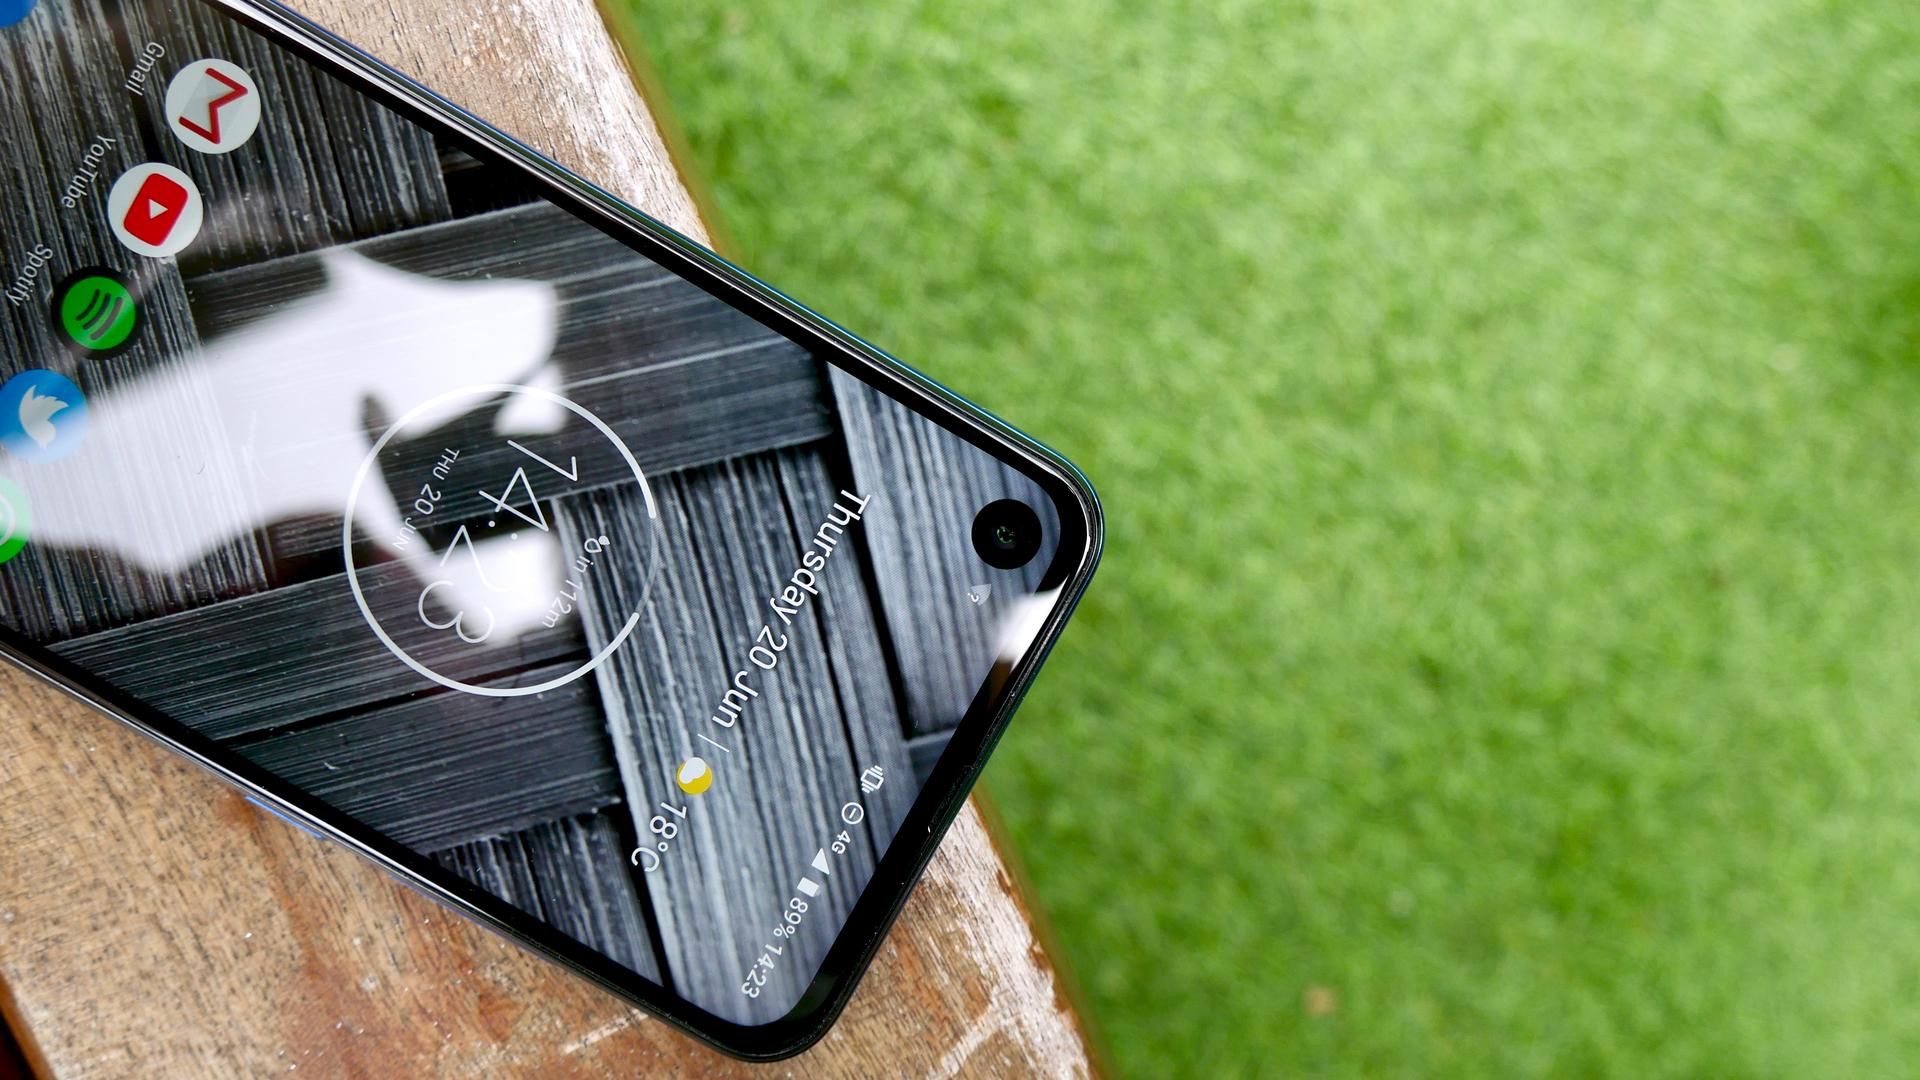 Motorola One Vision punch hole selfie camera